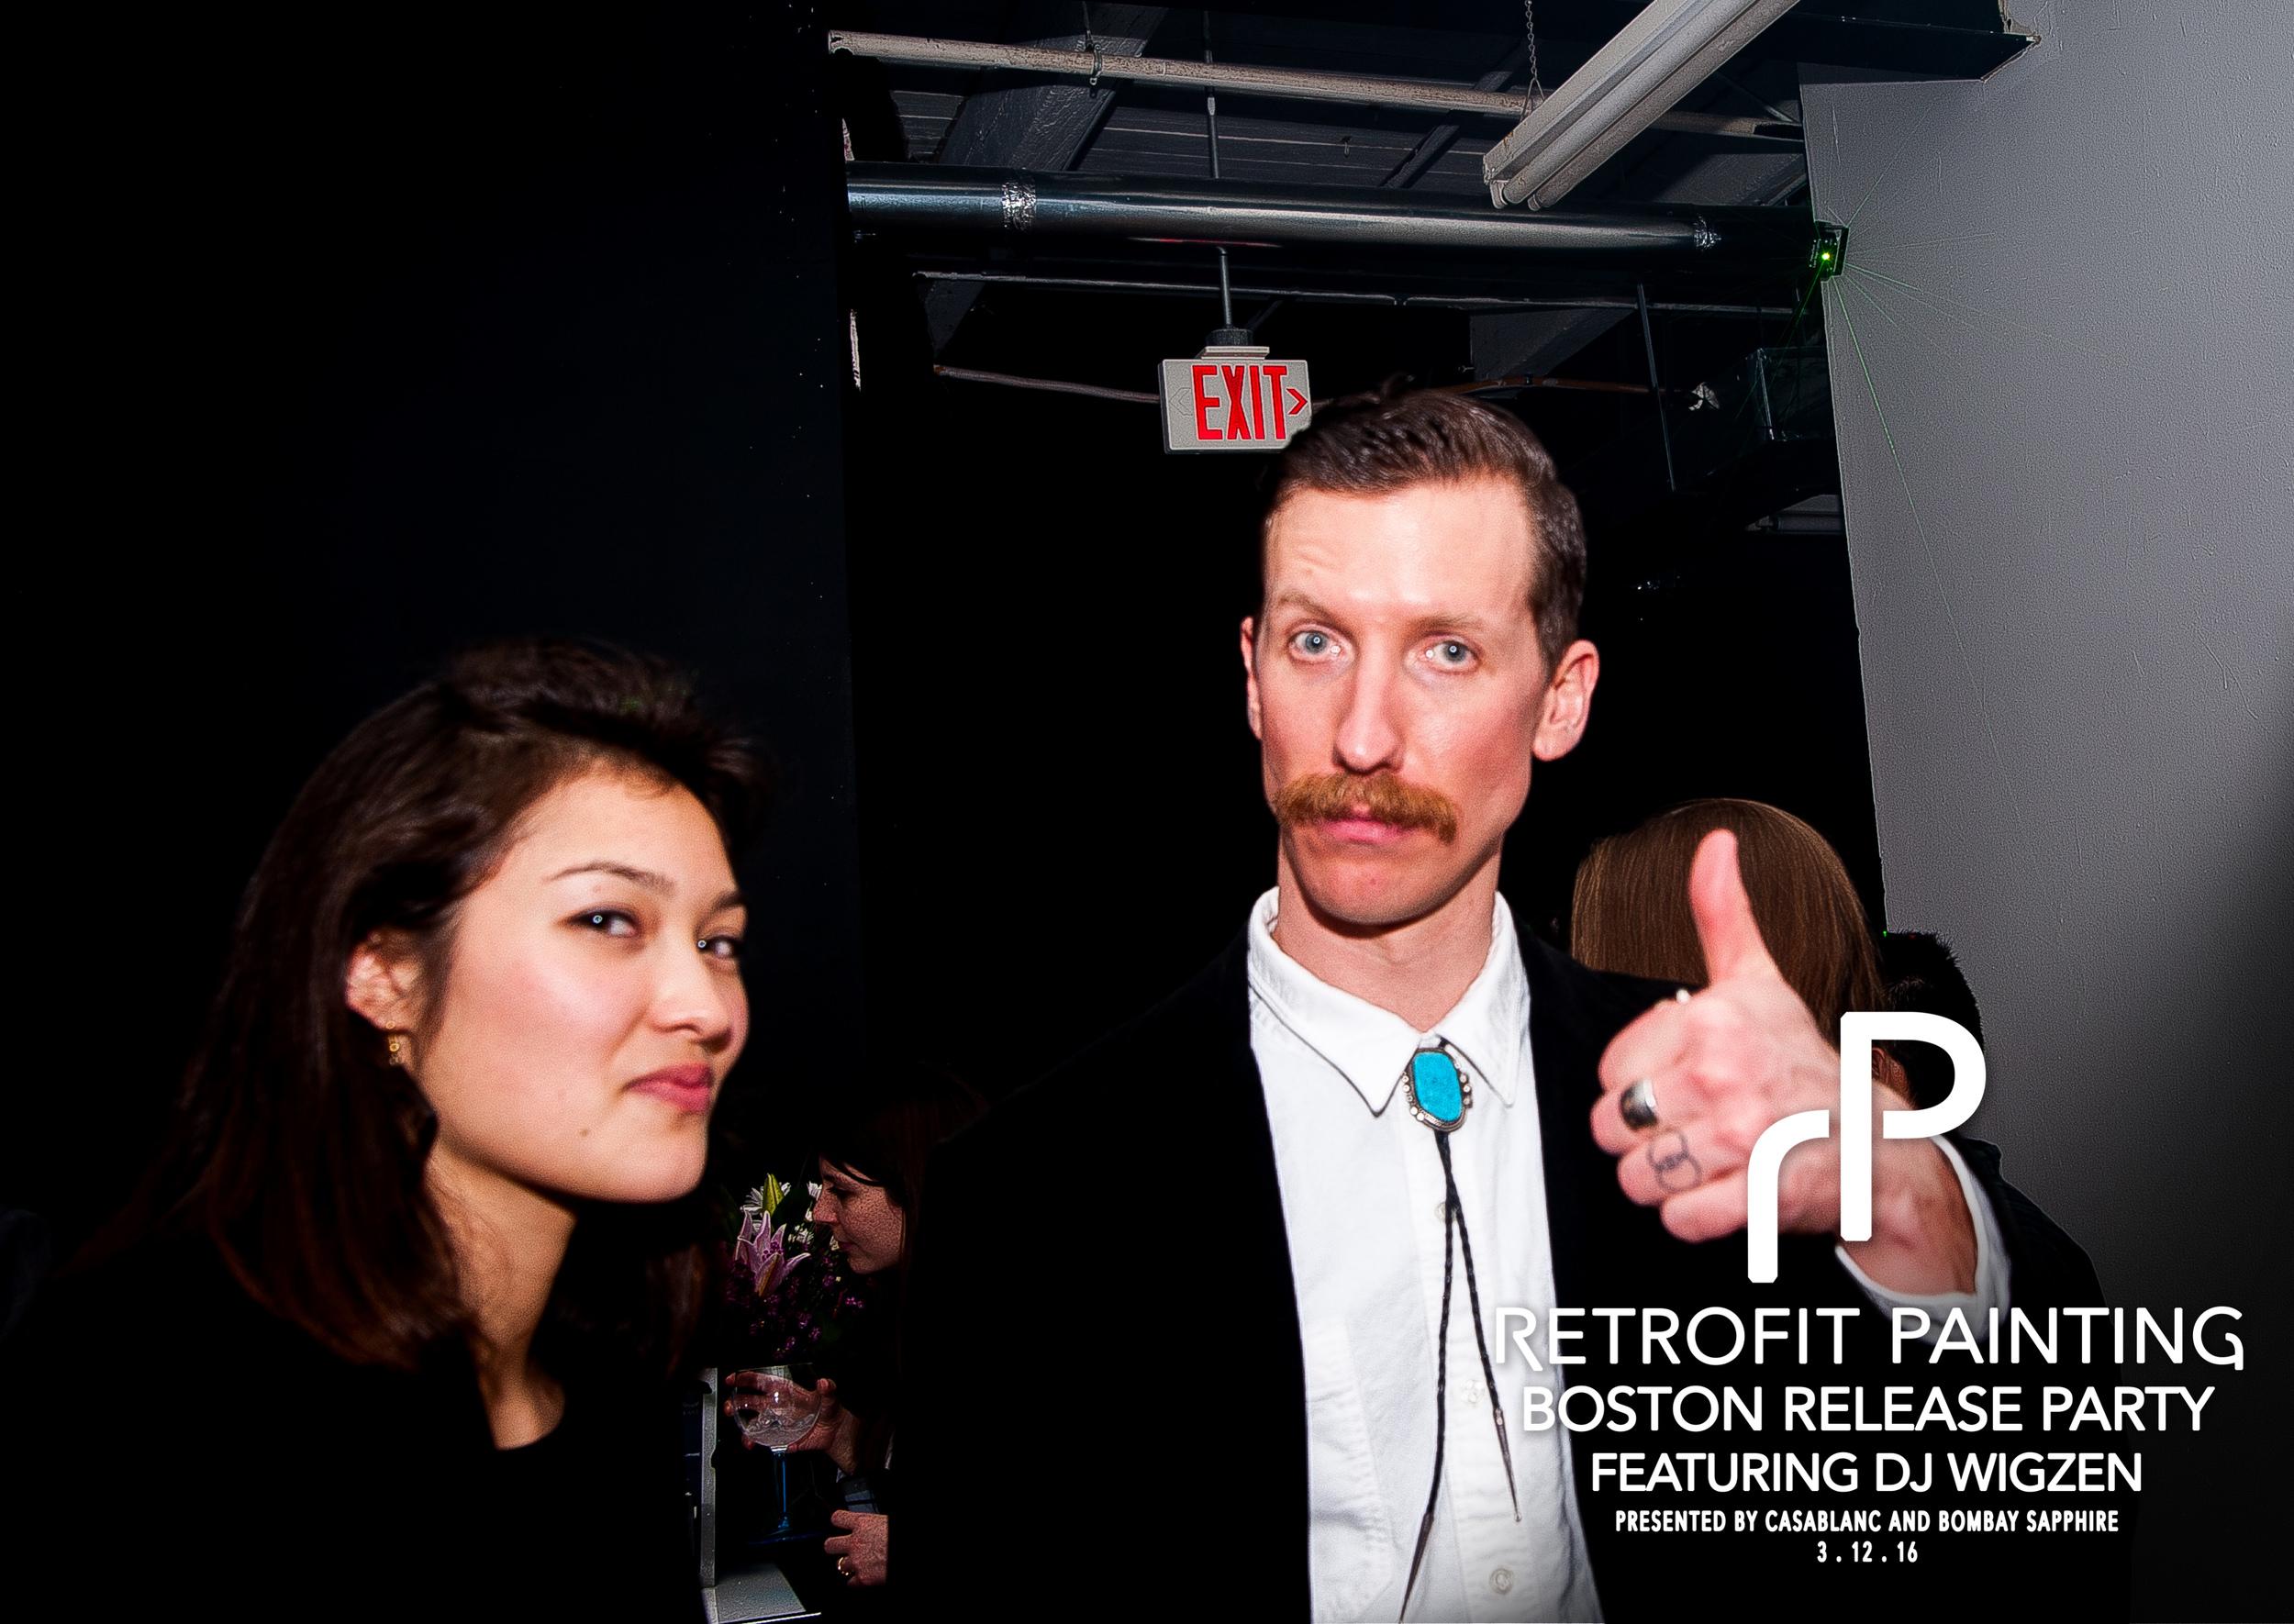 Retrofit Painting Boston Release Party 0011.jpg